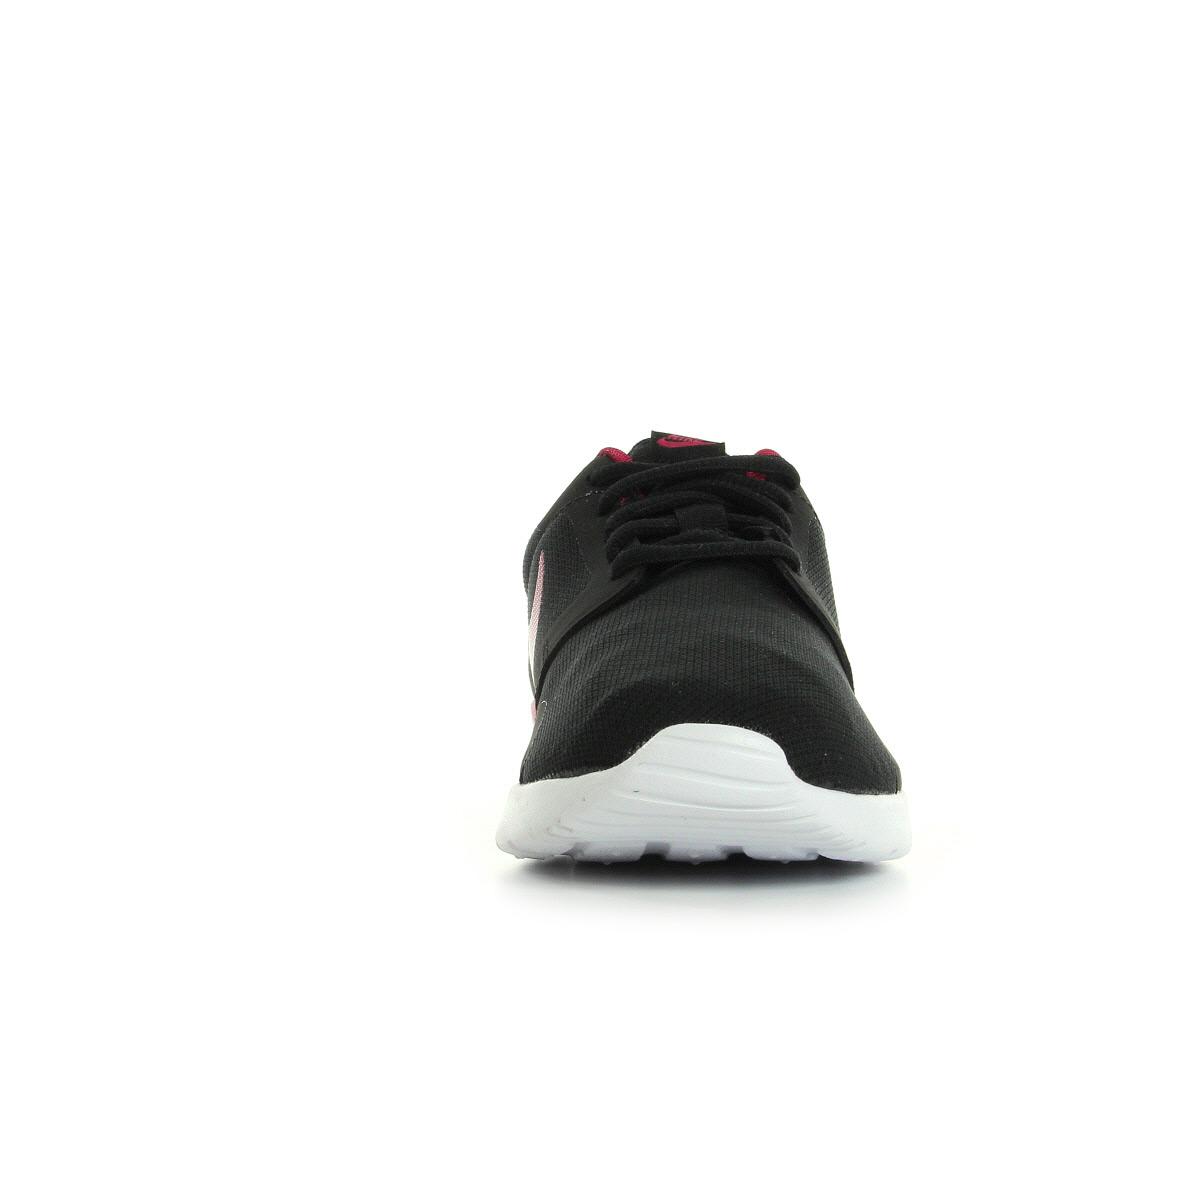 BNWB Nike 2.0 Air Max 1 Ultra 2.0 Nike Flyknit Metallic noir & Gold Trainers Multi Taille f590d3